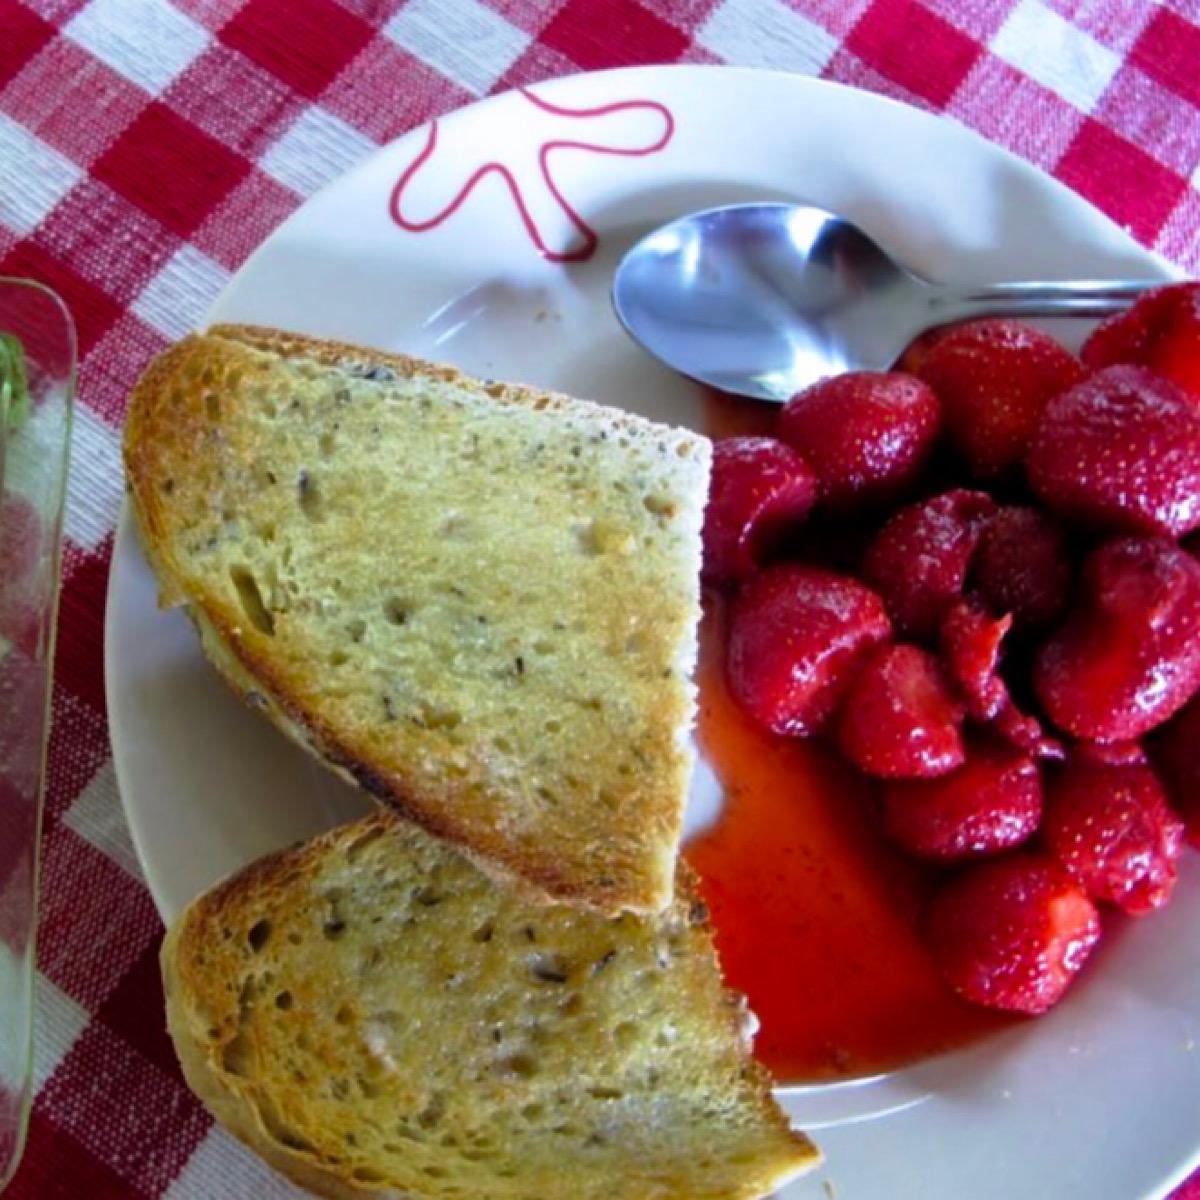 Fresh strawberries with balsamic vinegar sauce on breakfast plate